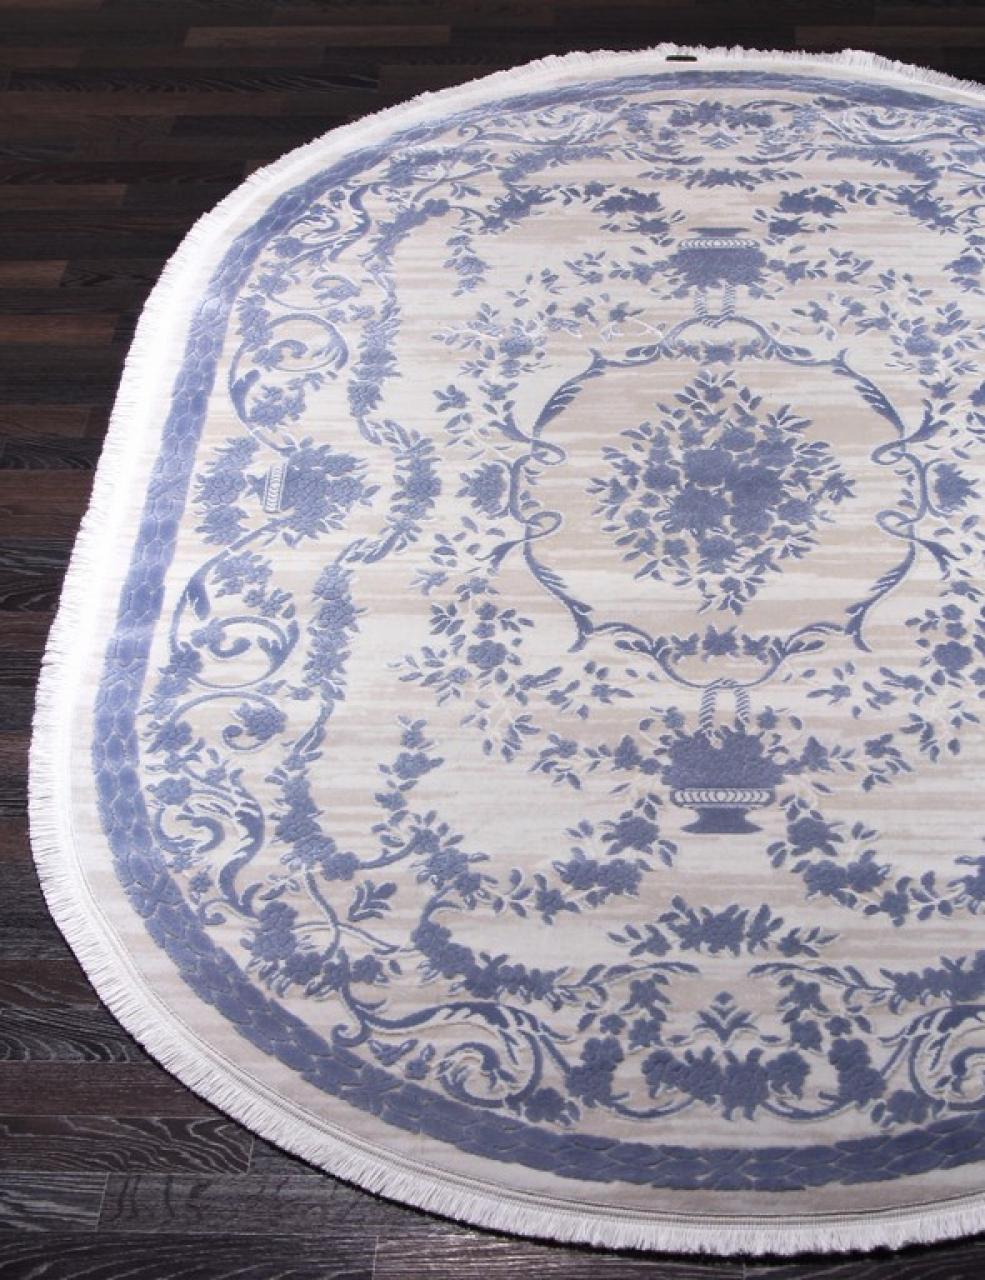 Ковер 08330T - BLUE / BLUE - Овал - коллекция TRUVA